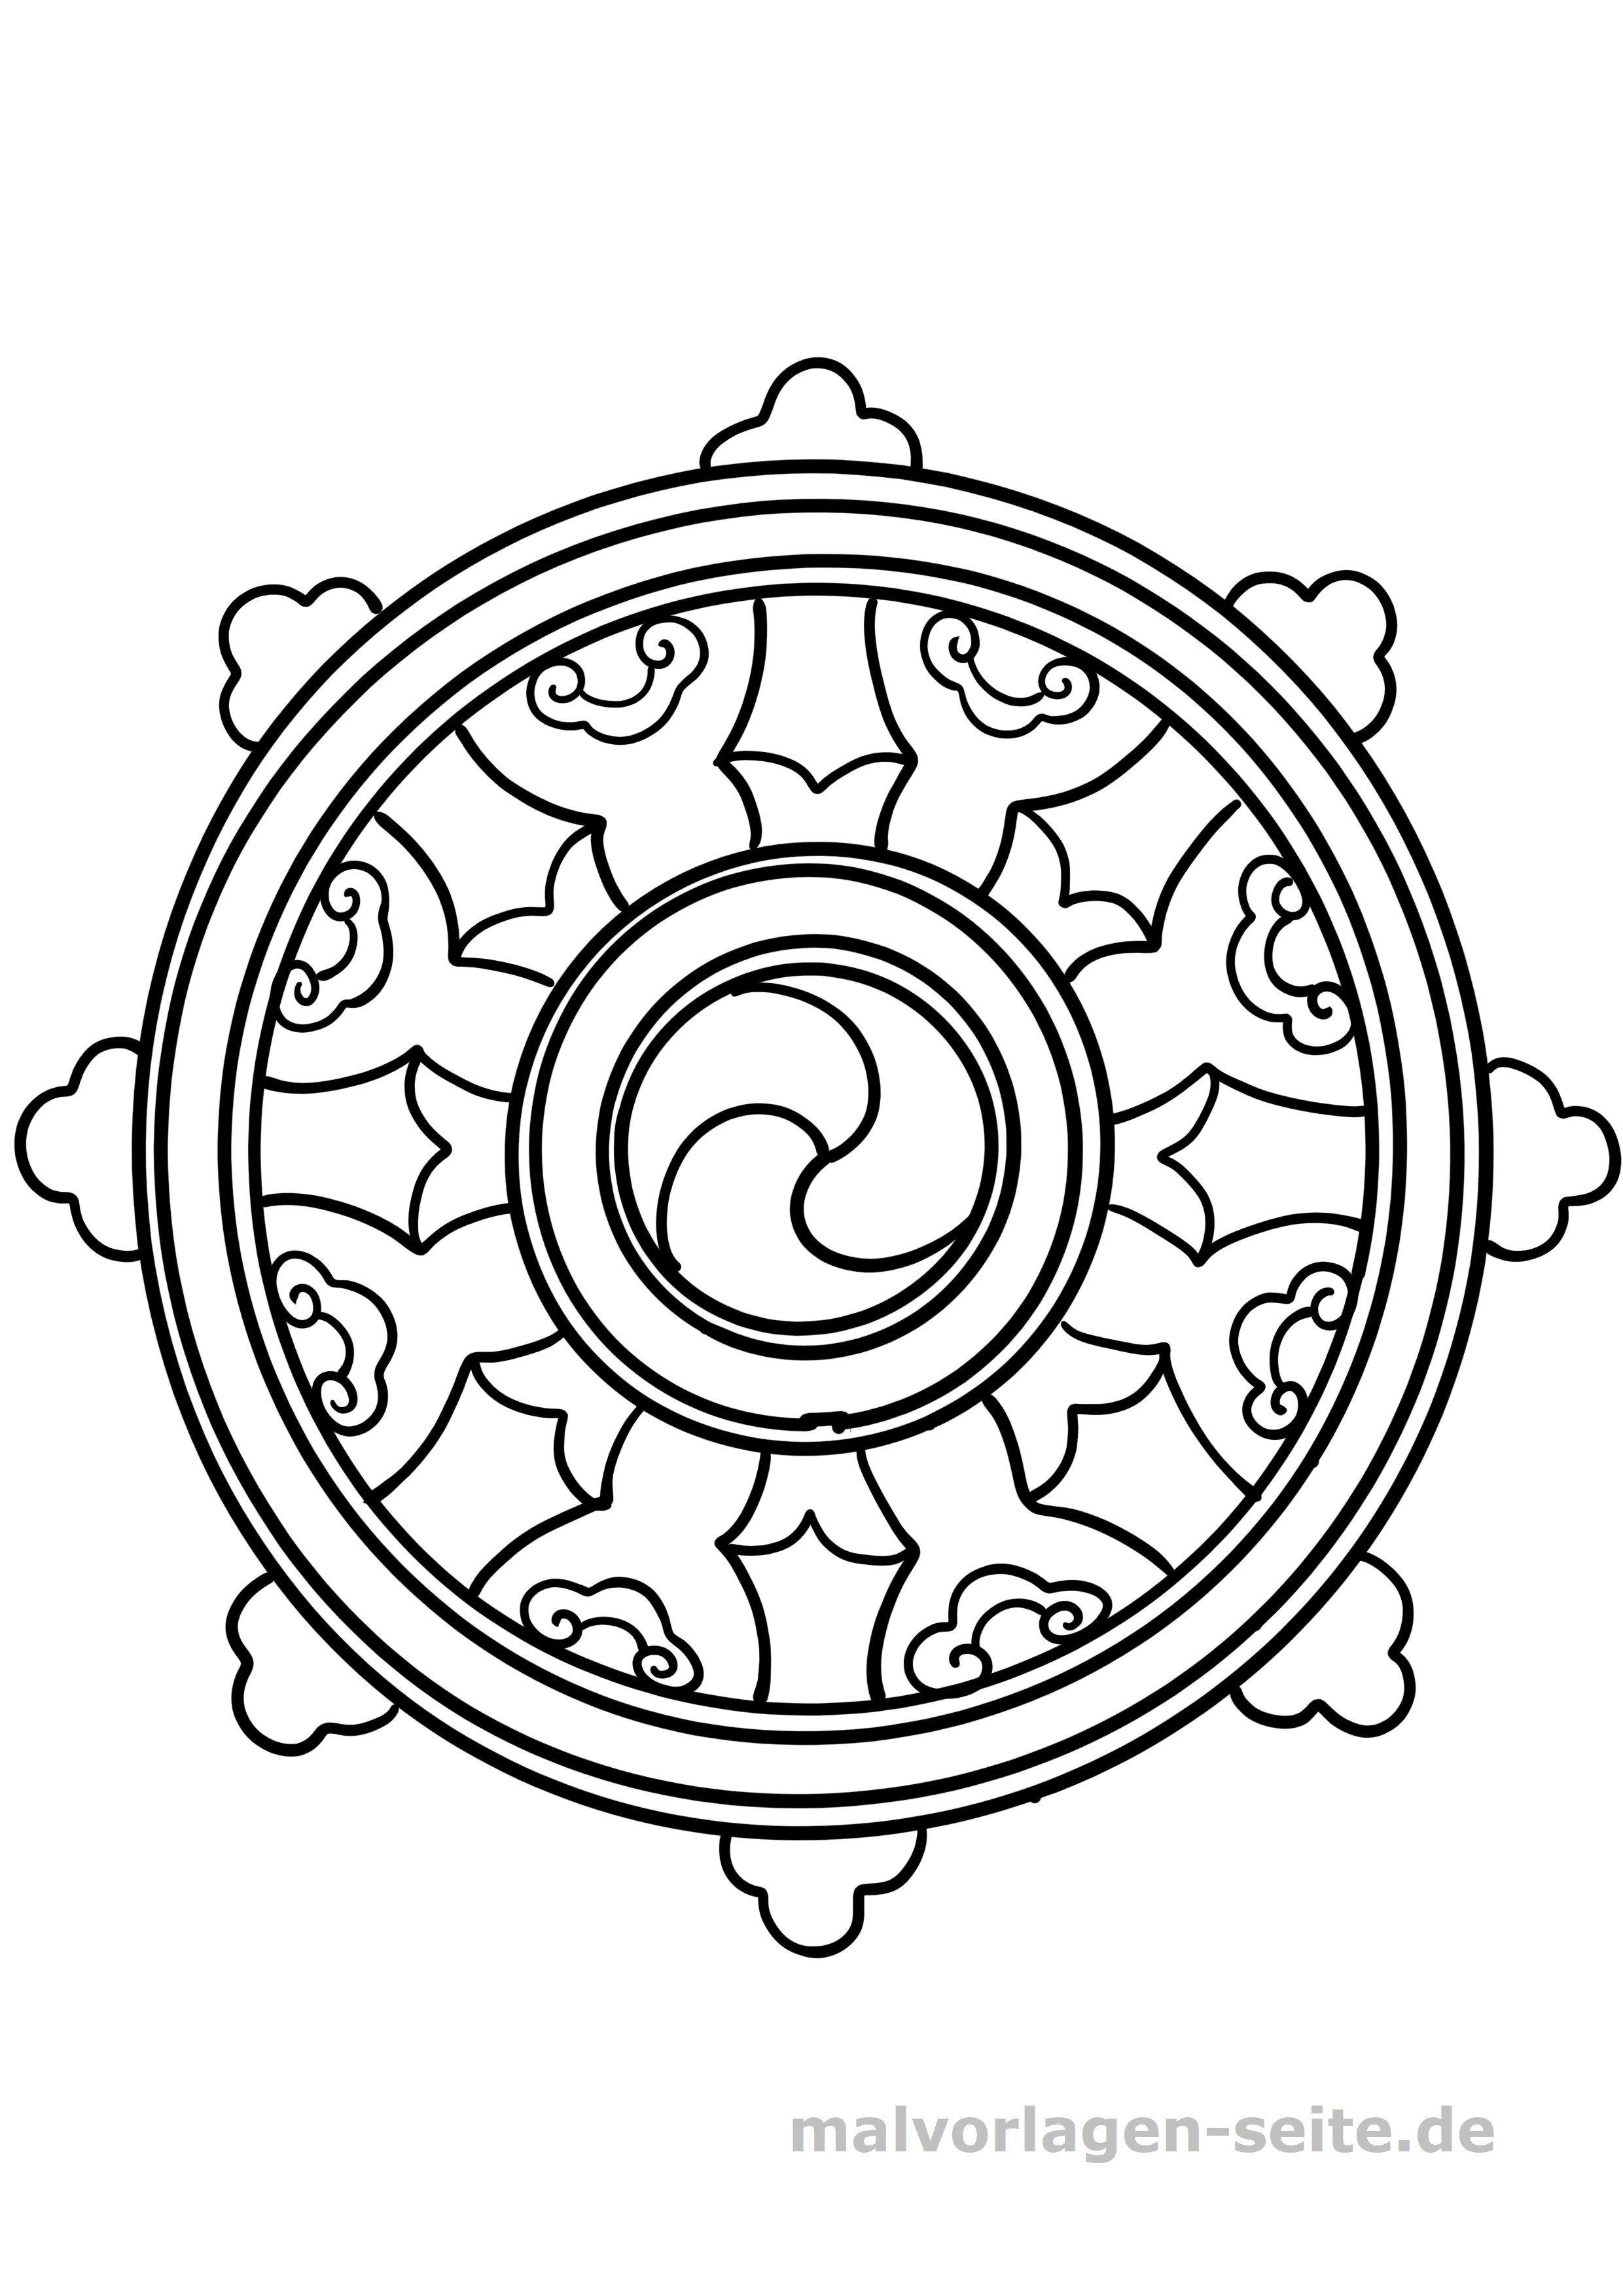 Symbole Malvorlage Buddhismus Rad Coloring And Malvorlagan